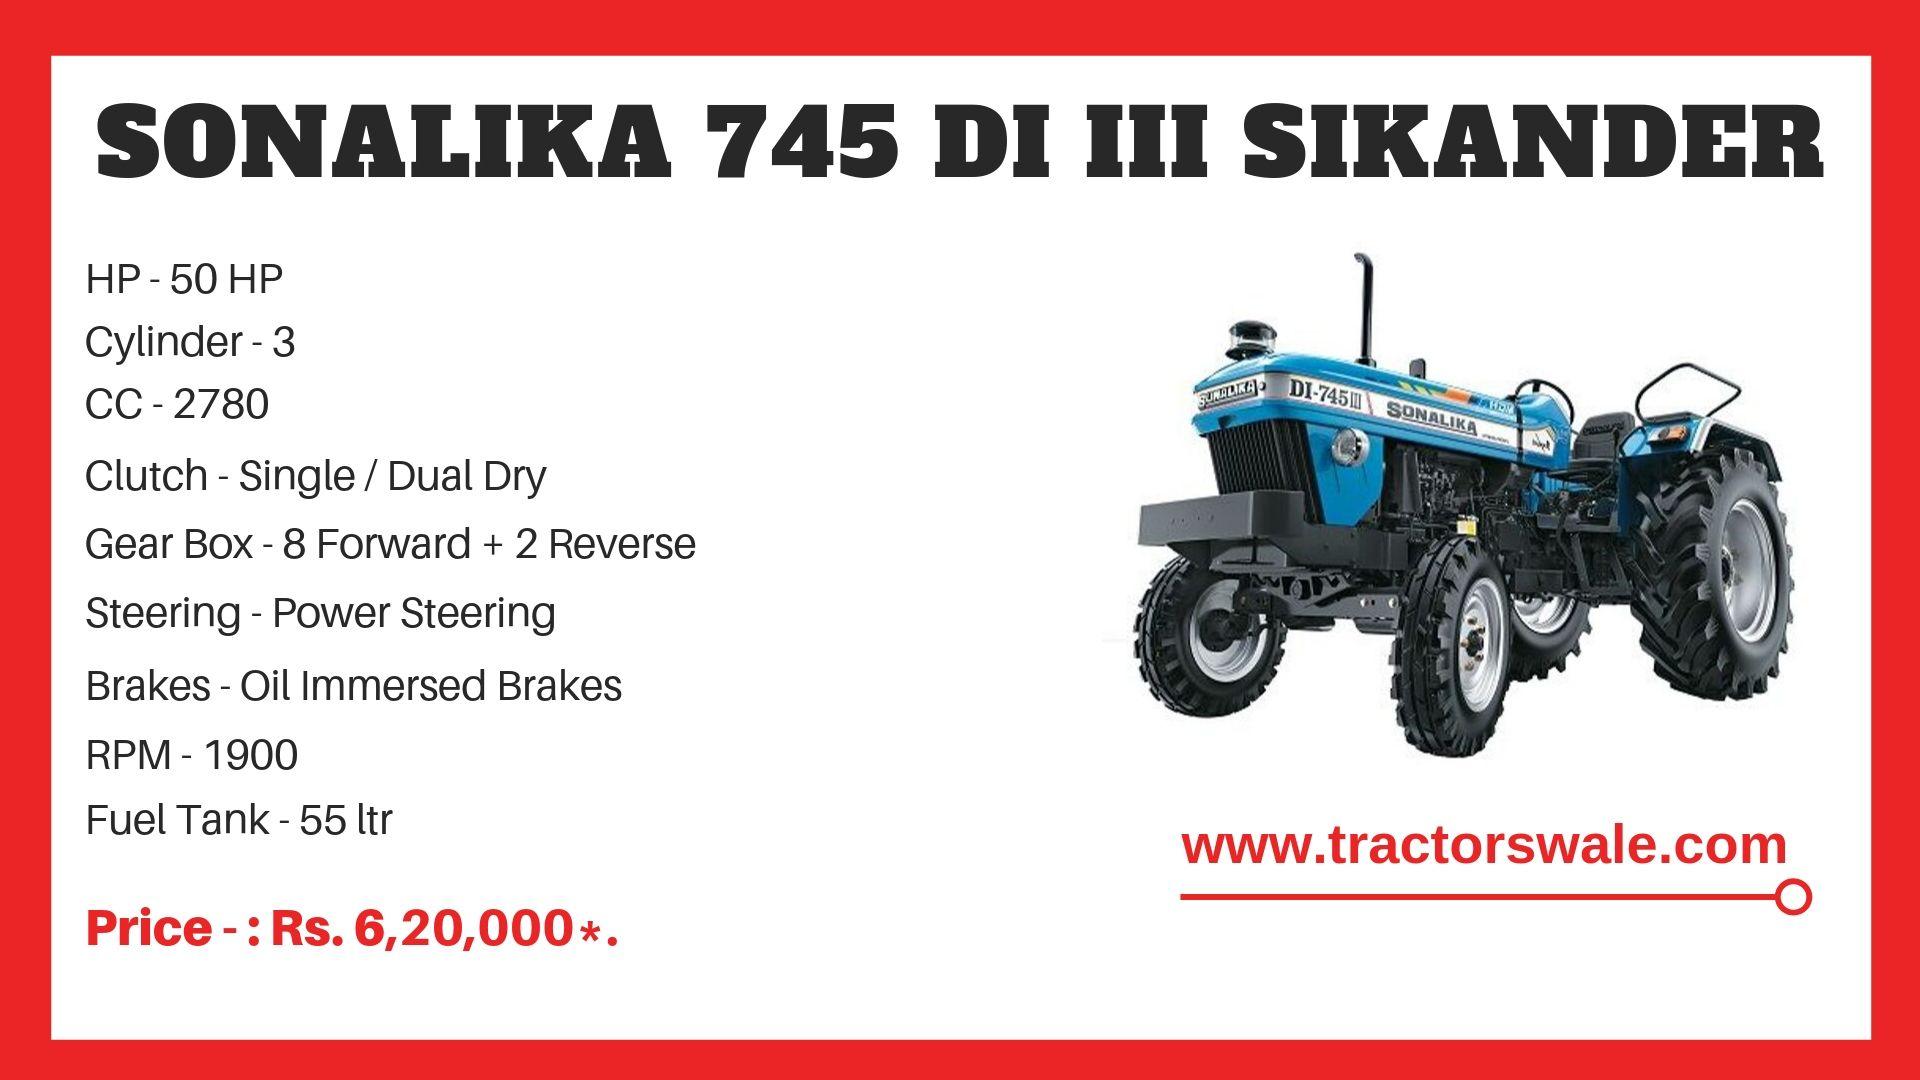 Sonalika tractor 745 DI specs